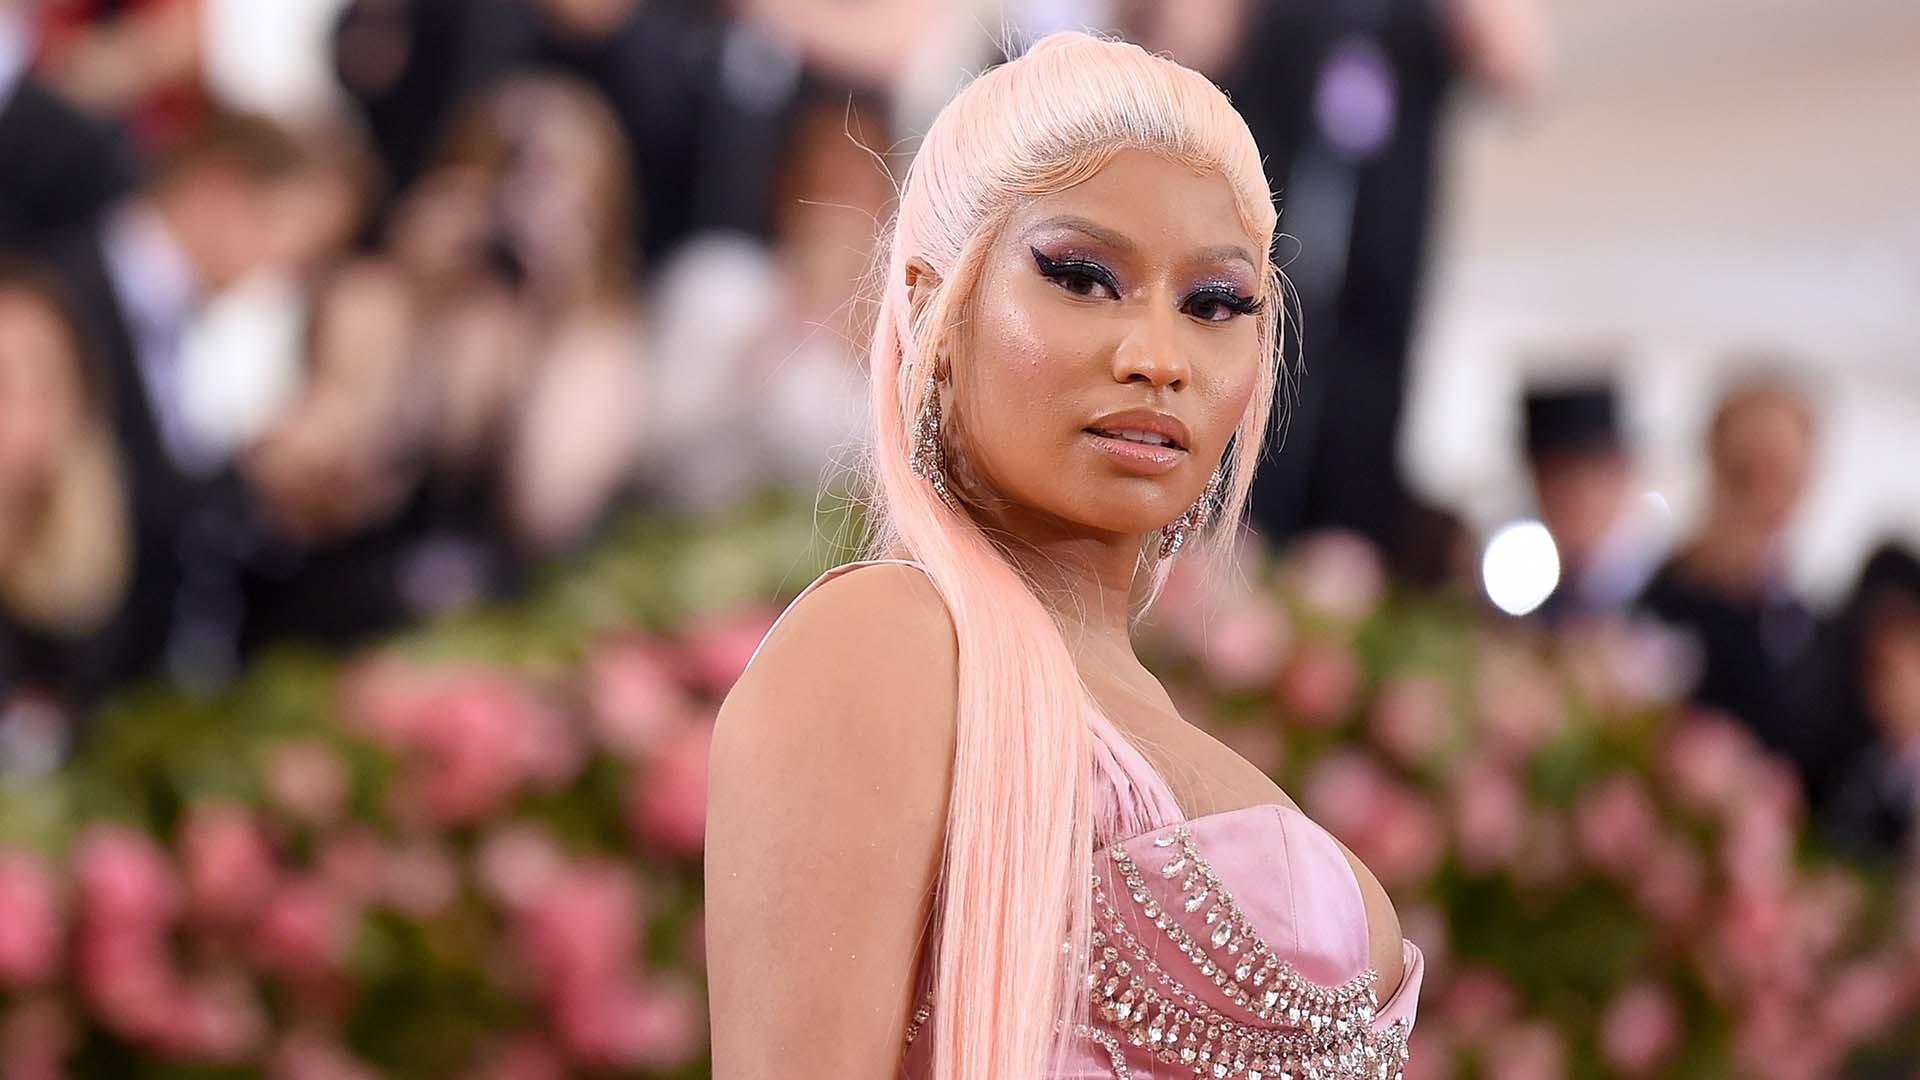 Nicki Minaj's Hot Pink Crocs Crash Retailer's Website - Billboard